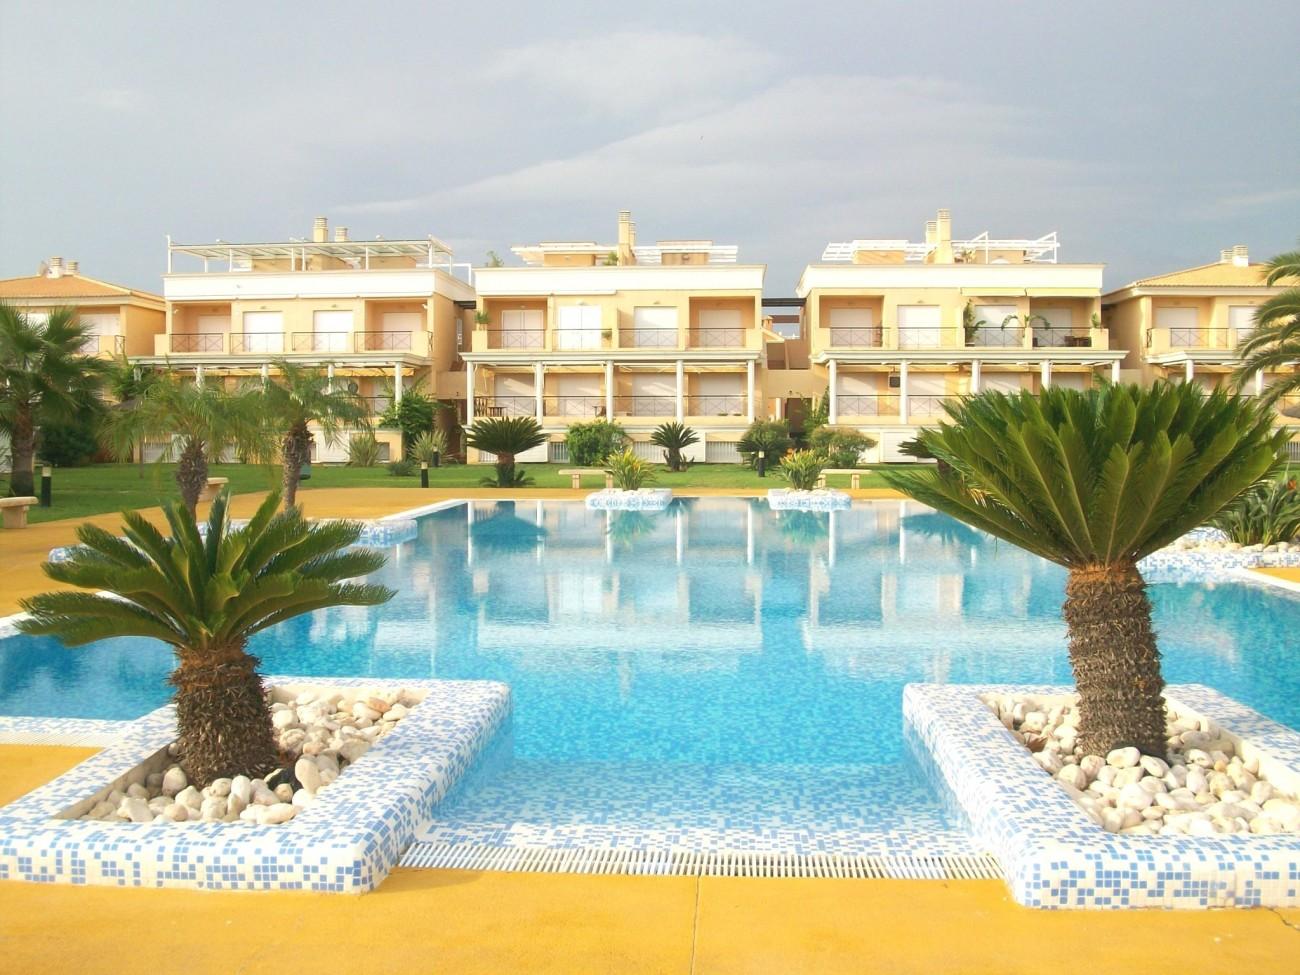 Apartments in Oliva - CASAS DEL MAR - Nº 042 , OLIVA NOVA